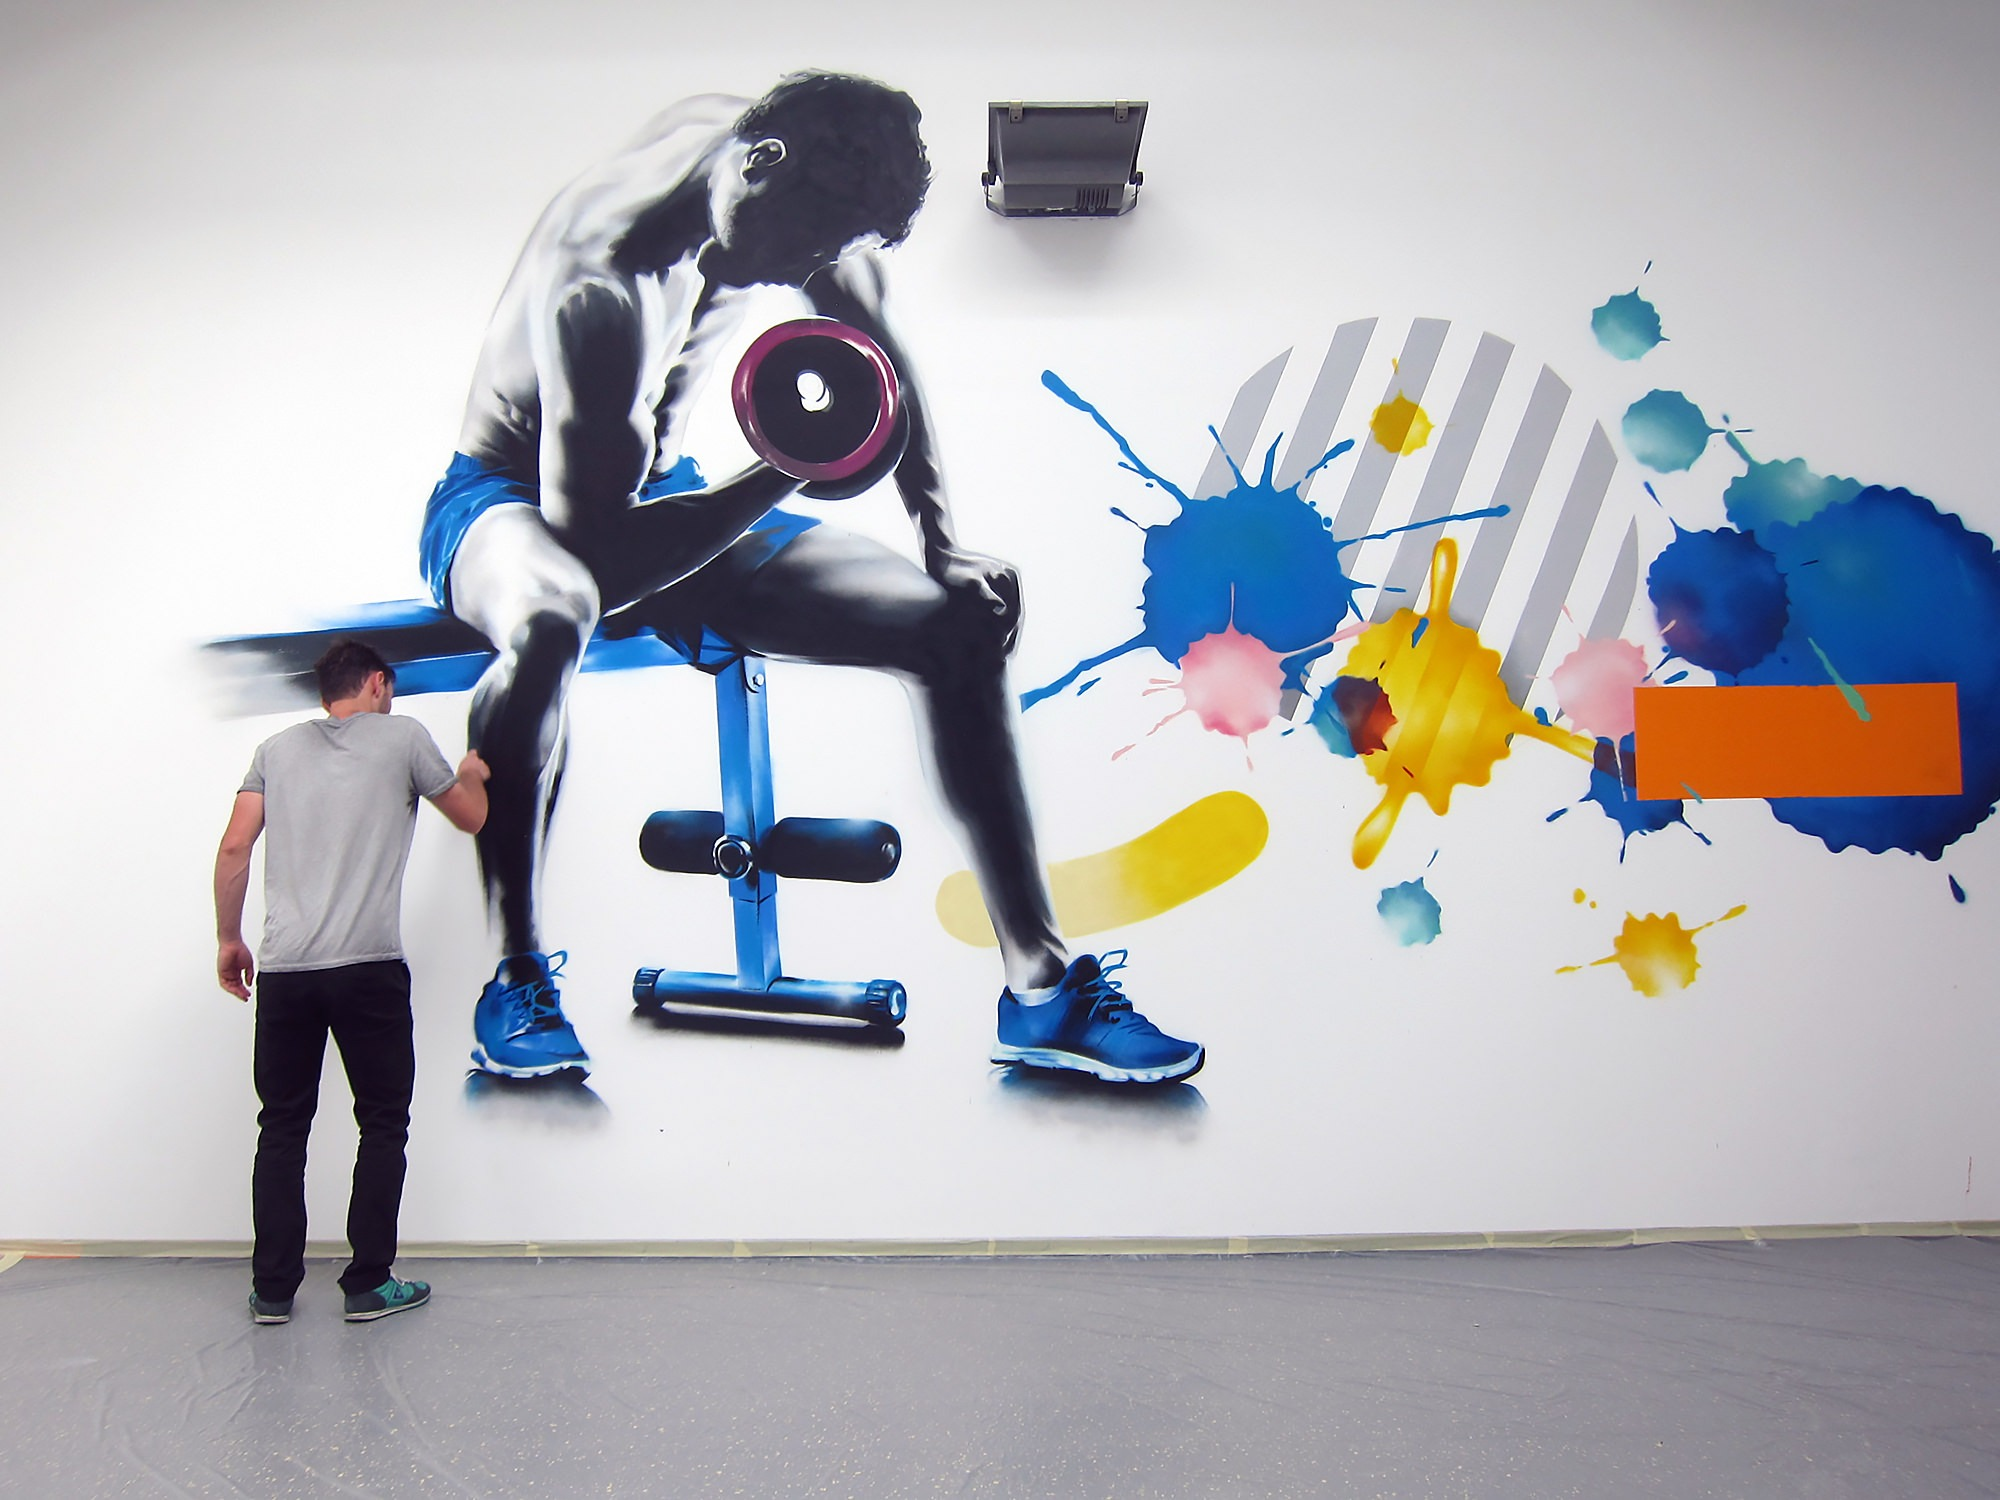 03-salle-sport-fresque-graff-tag